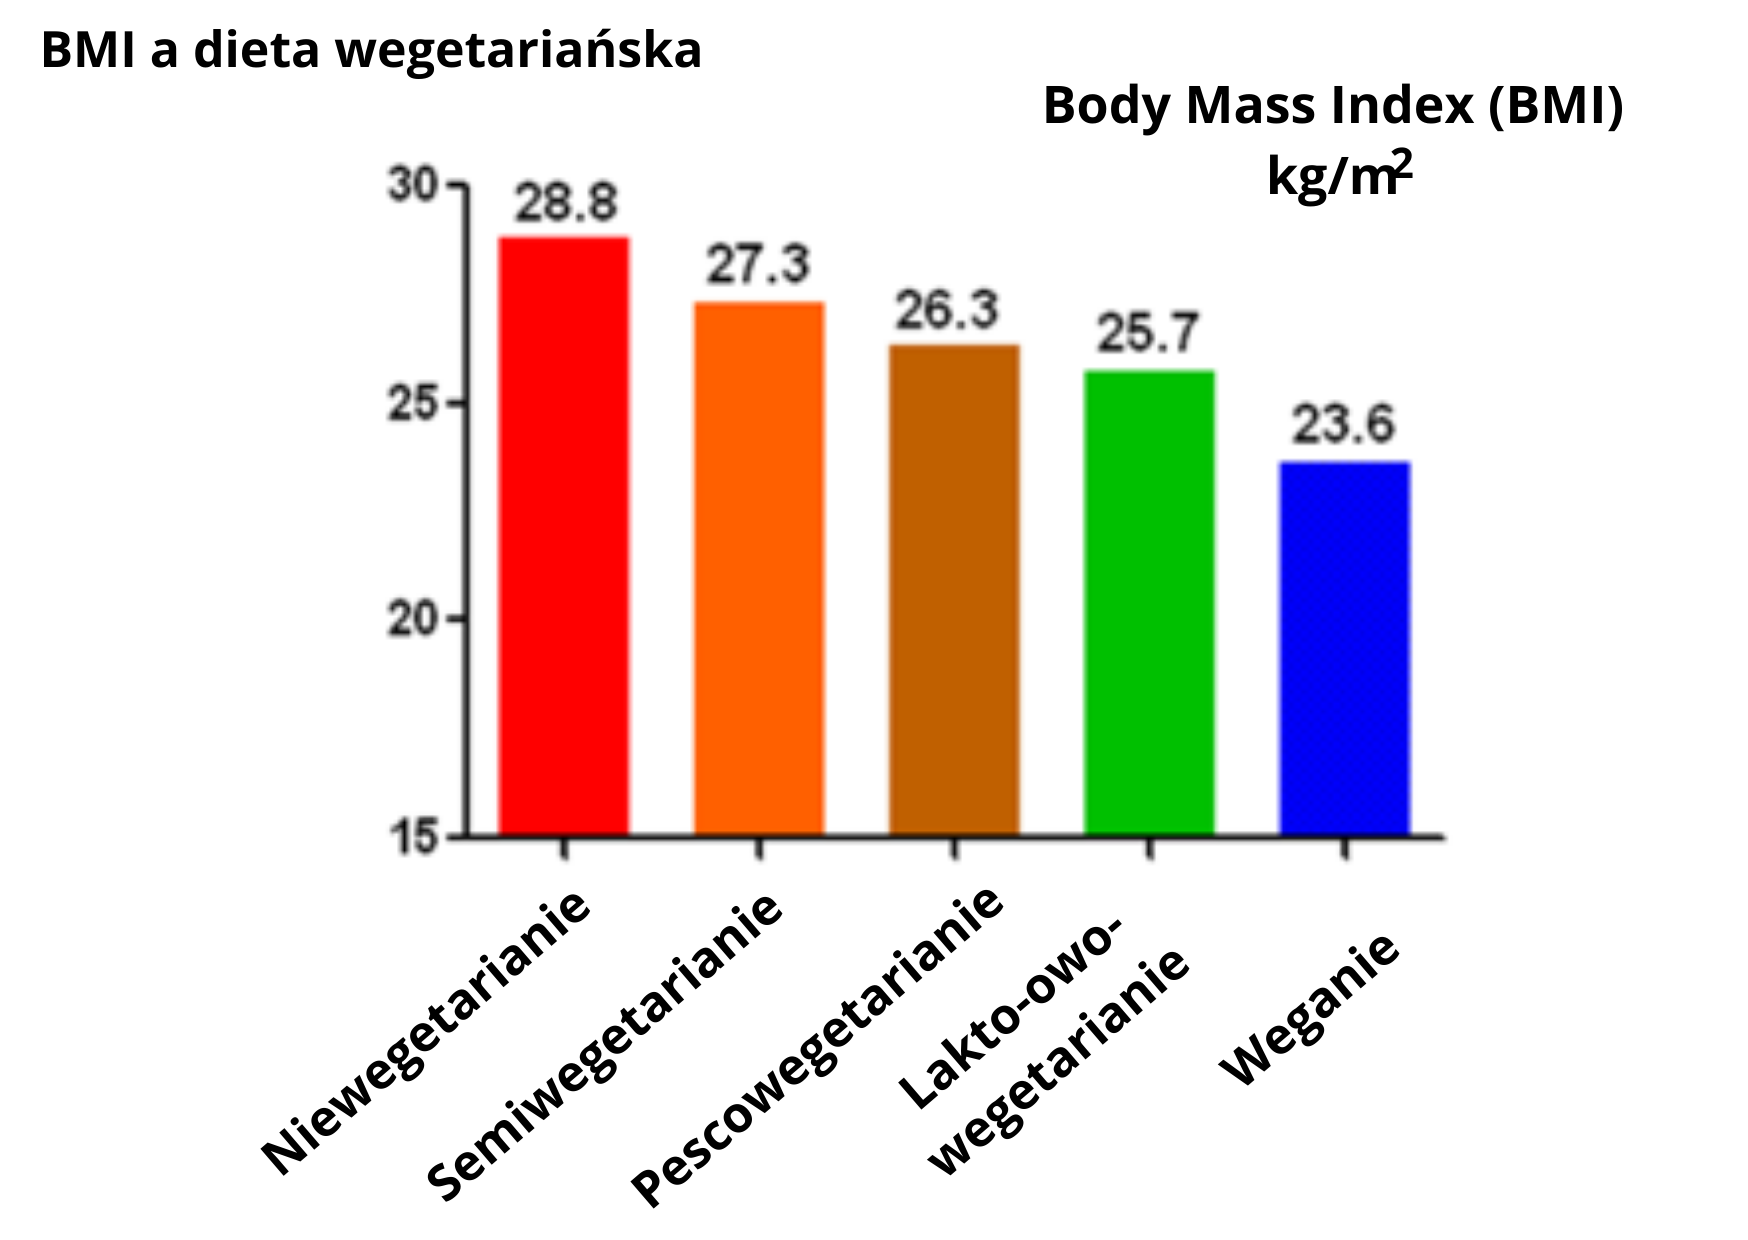 wykres dieta wegetariańska a bmi